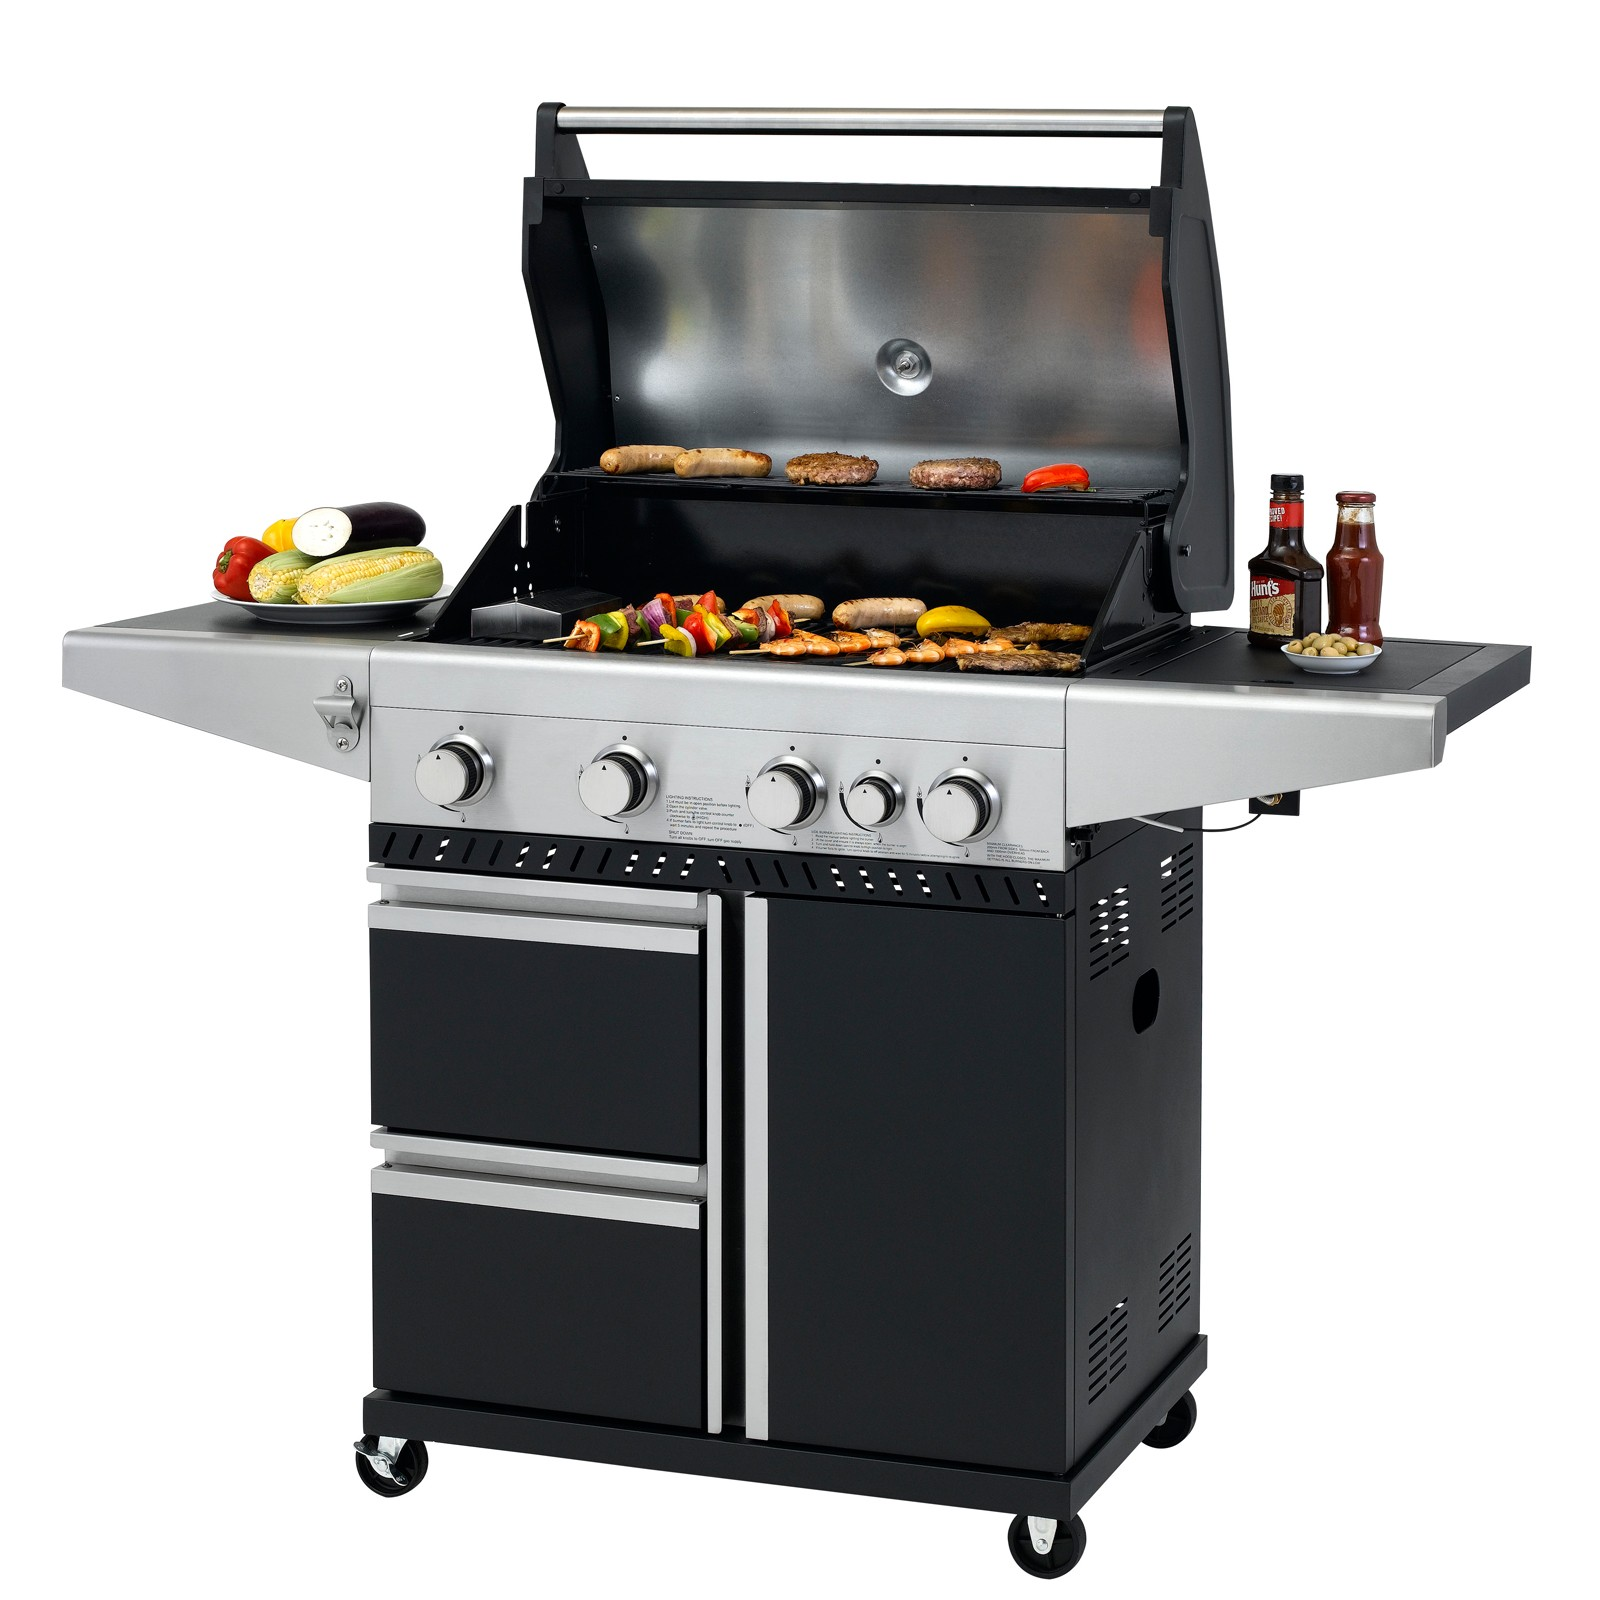 Tepro Gasgrill BBQ Grillwagen 4 Edelstahl Brenner Gas Barbecue Grill Fairmont 3171